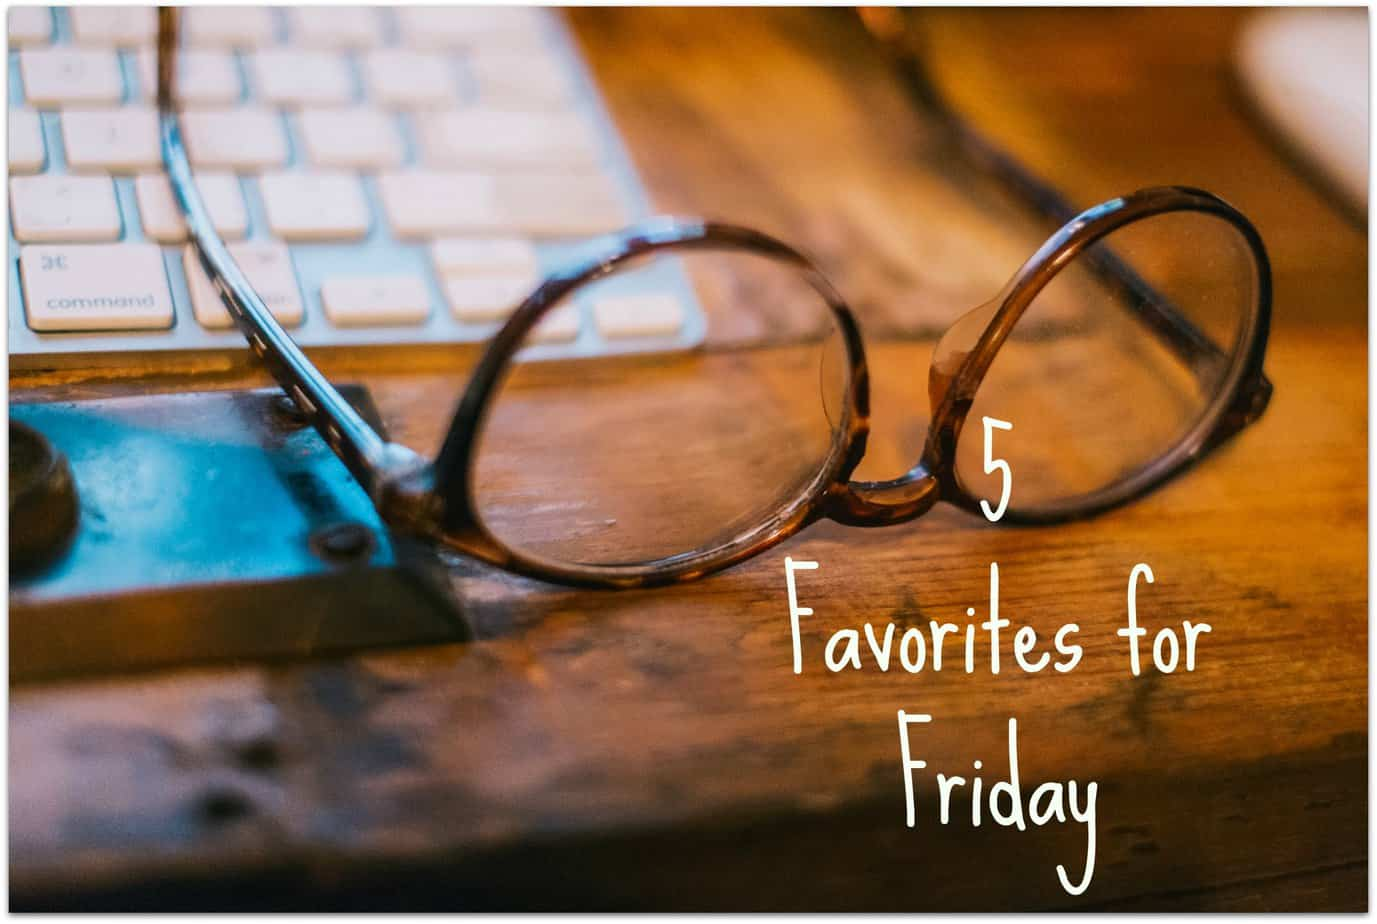 5 favorites for Friday